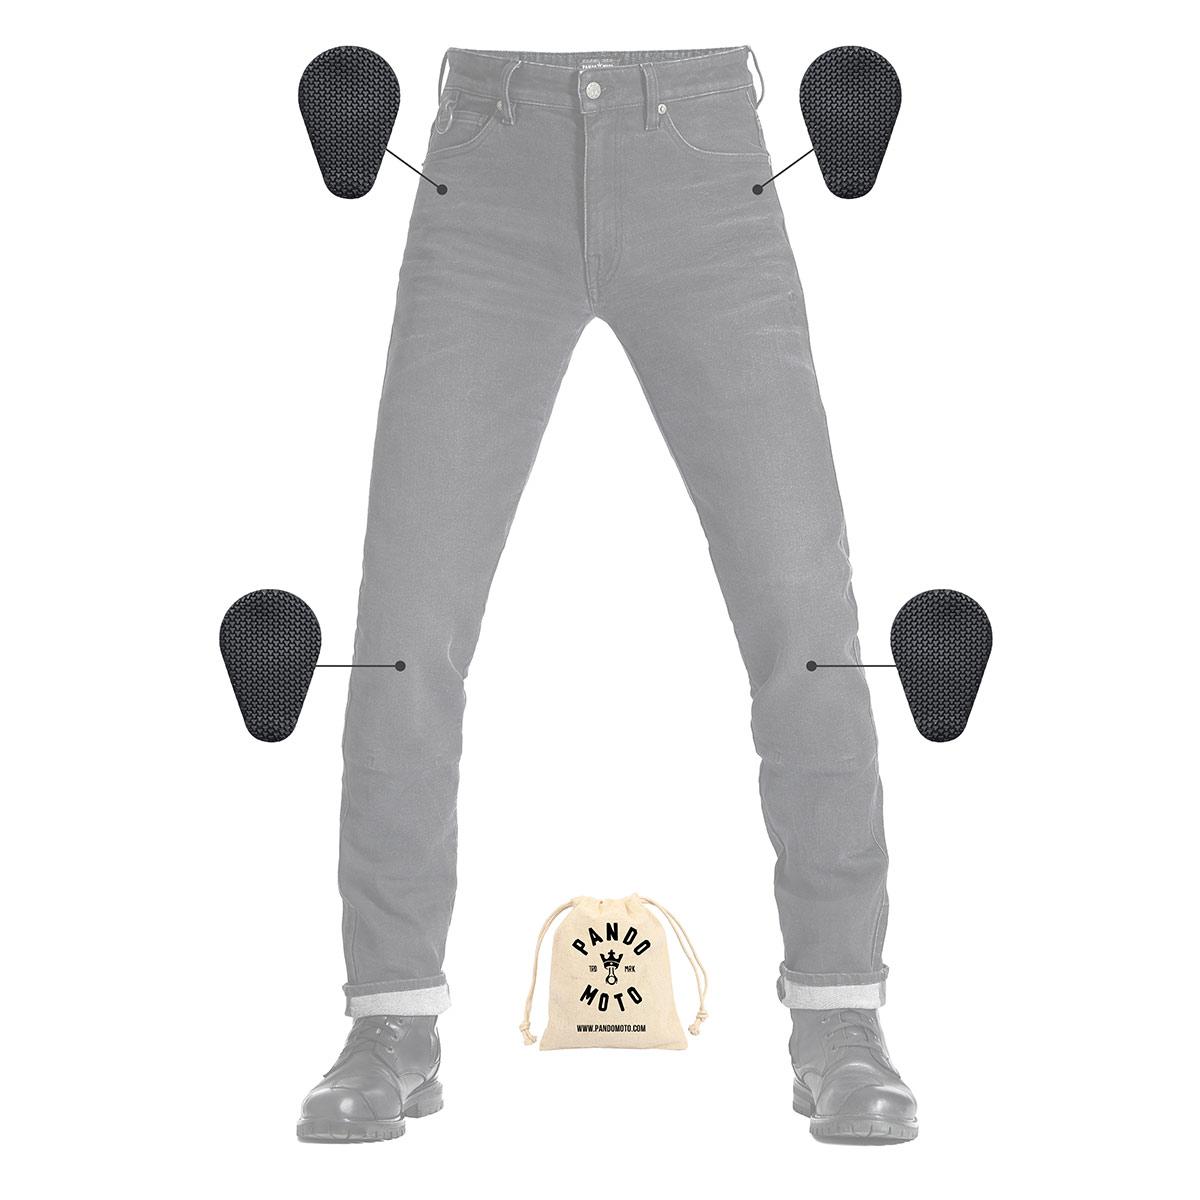 Pando Moto Robby Arm 01 Men's Jeans